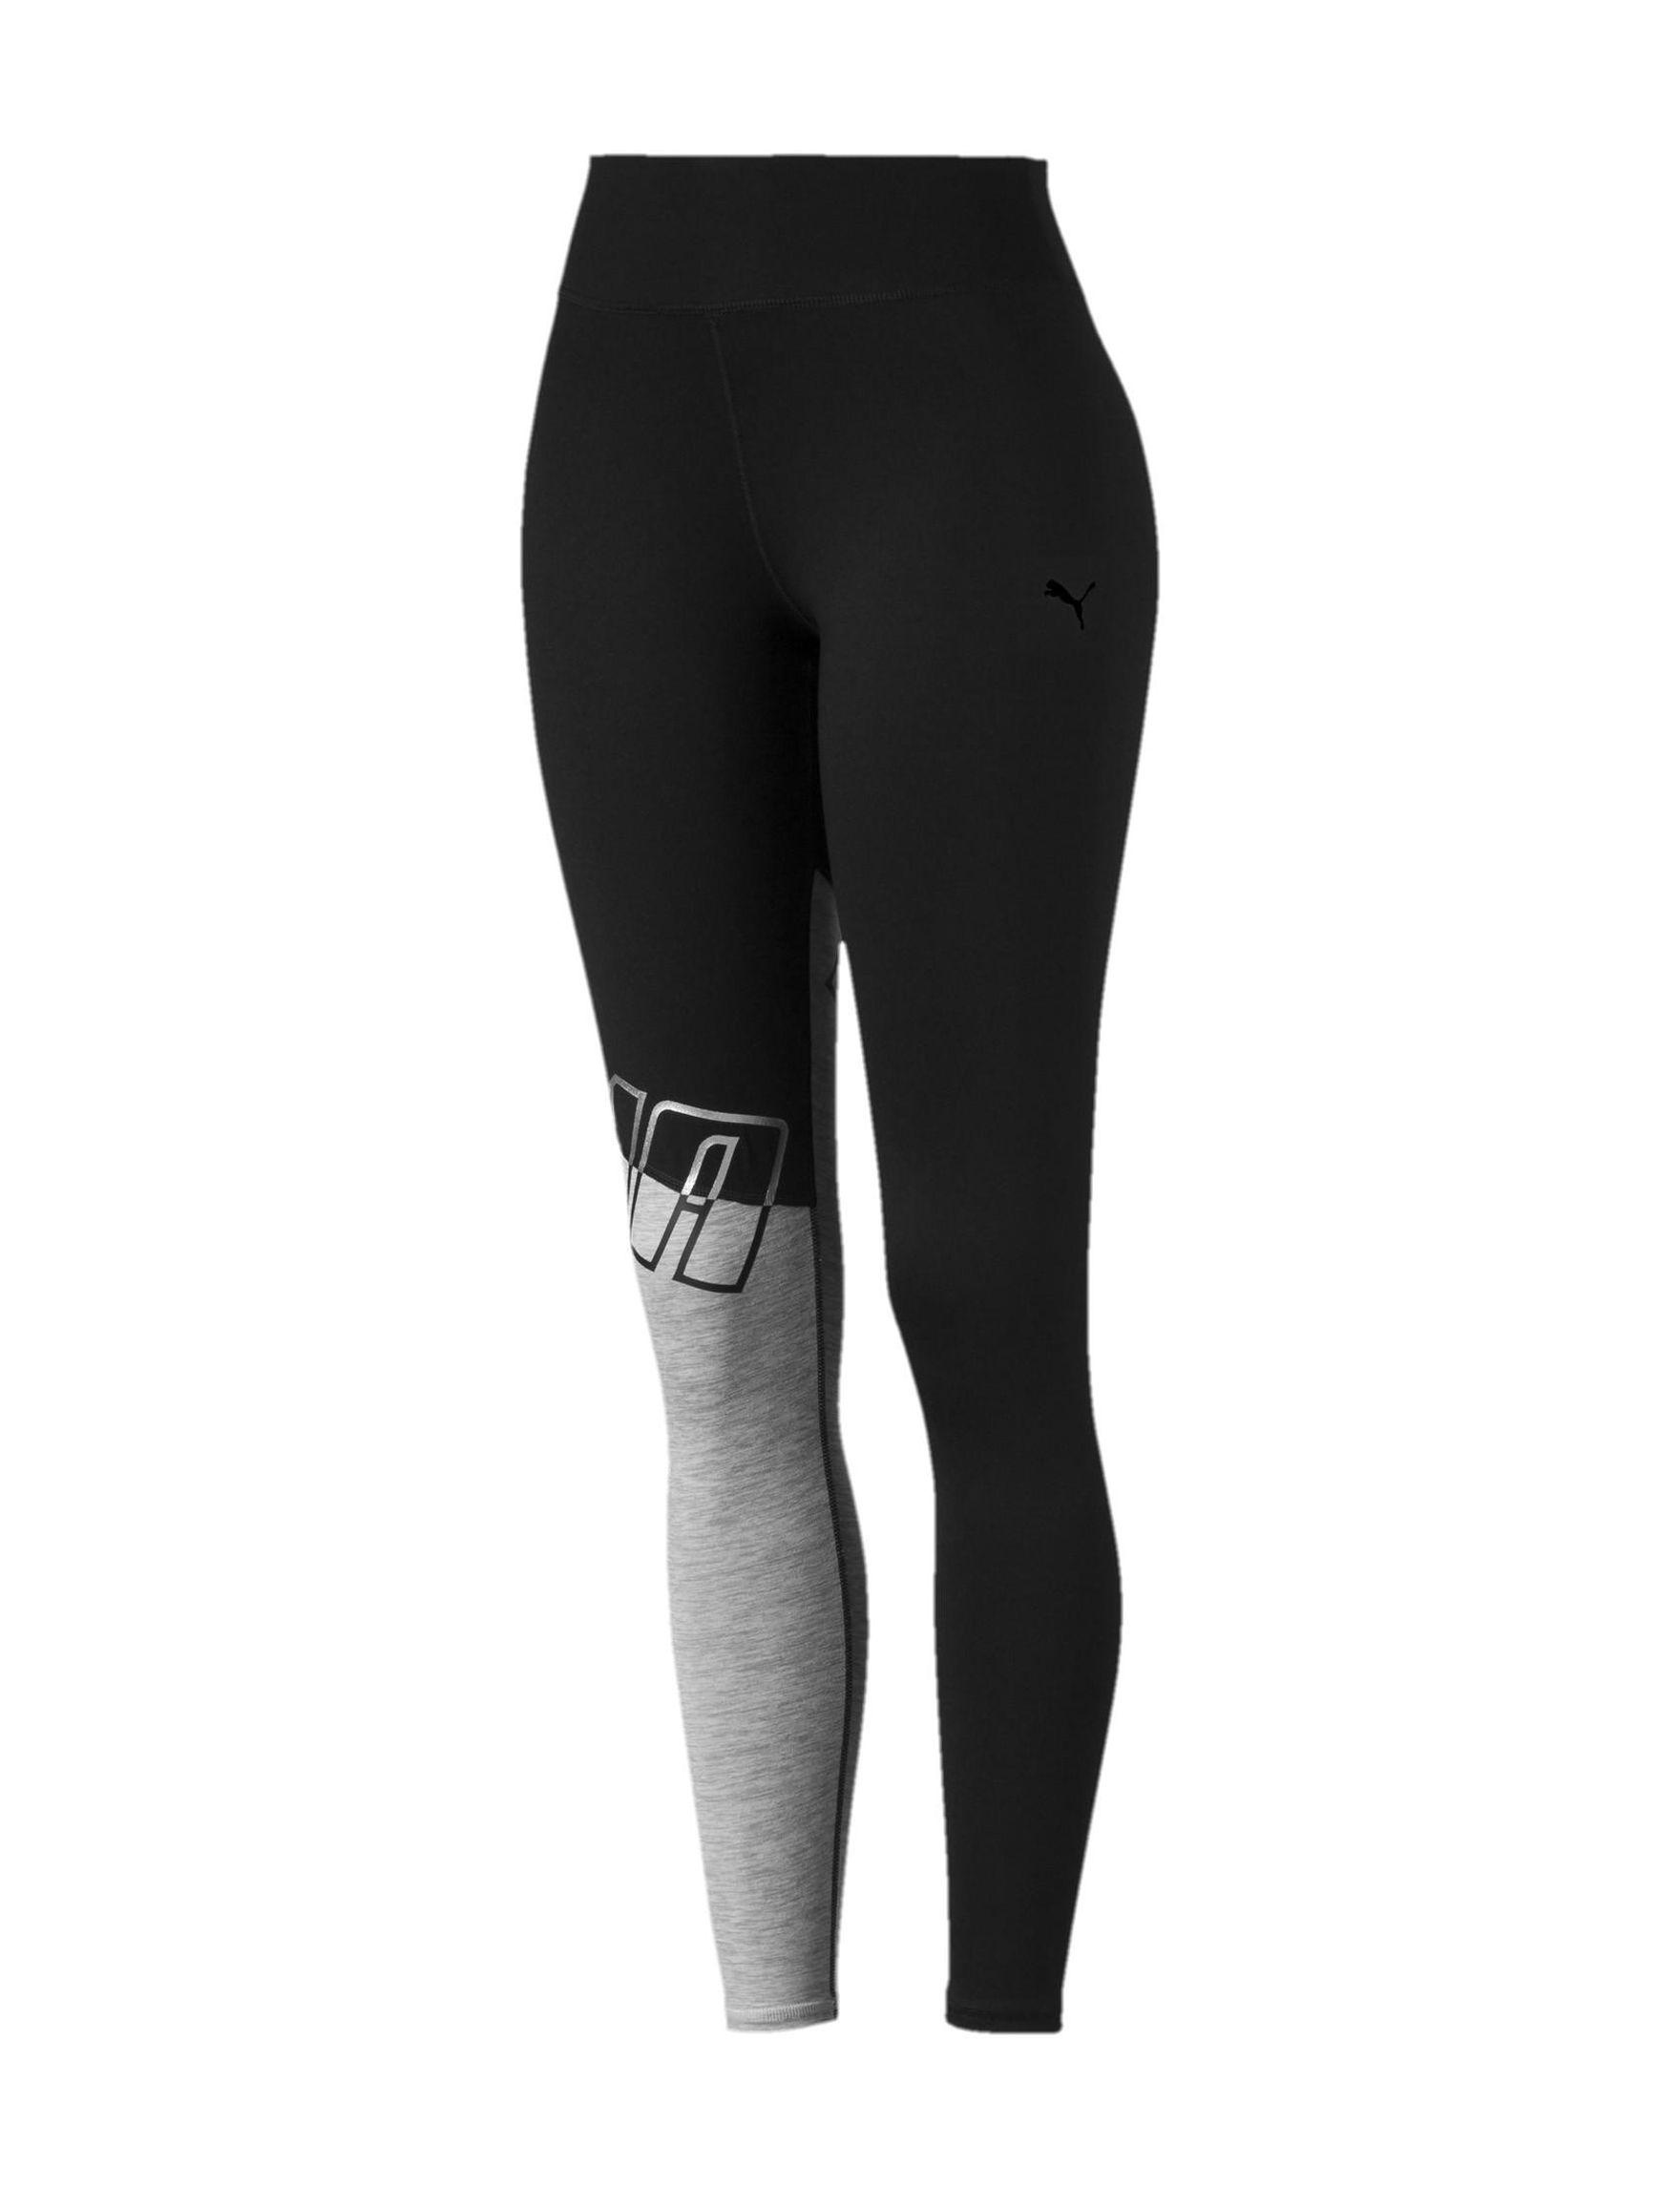 Puma Black / Grey Leggings